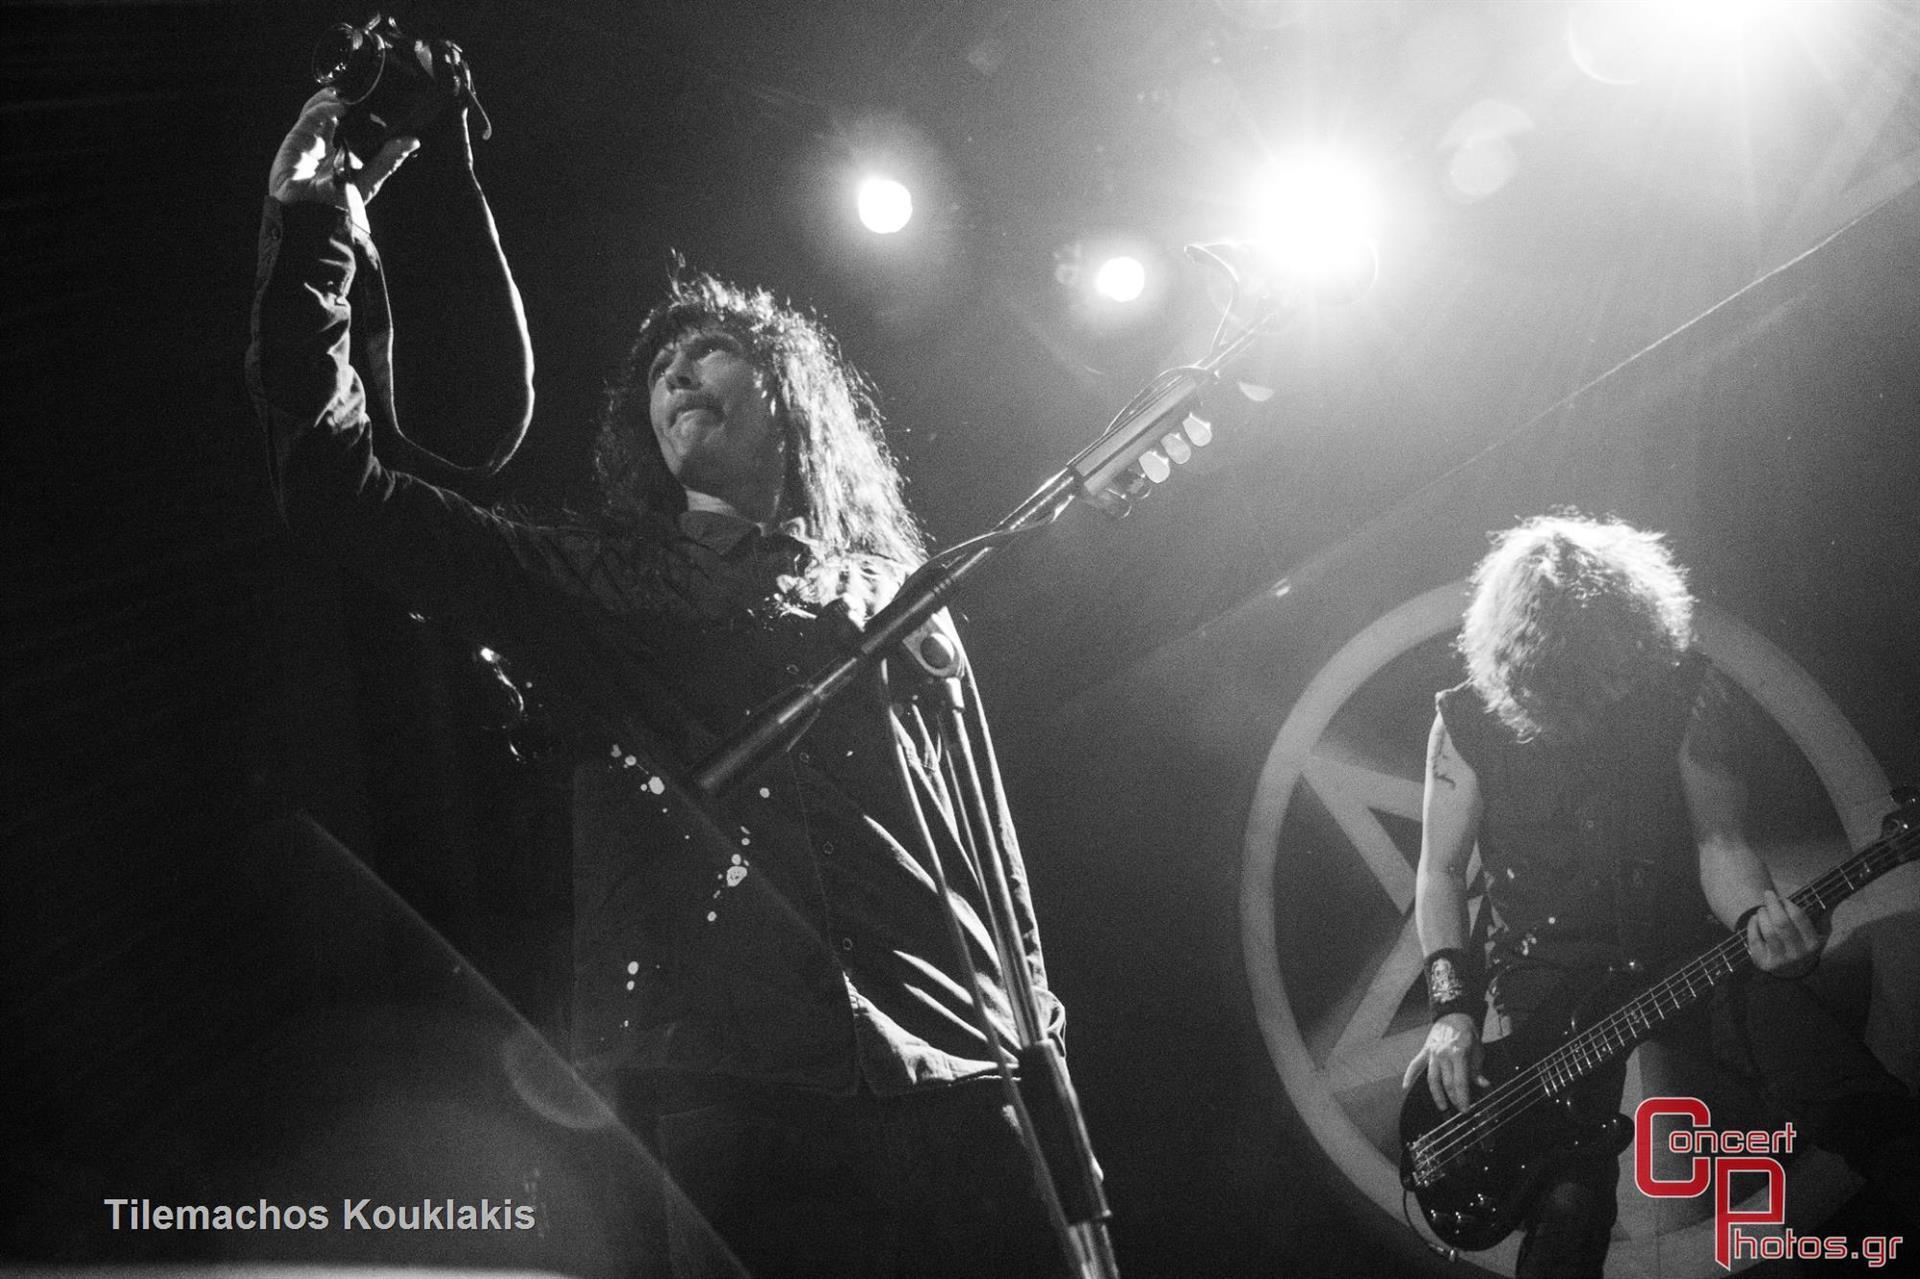 Anthrax-Anthrax photographer: Tilemachos Kouklakis - IMG_1778